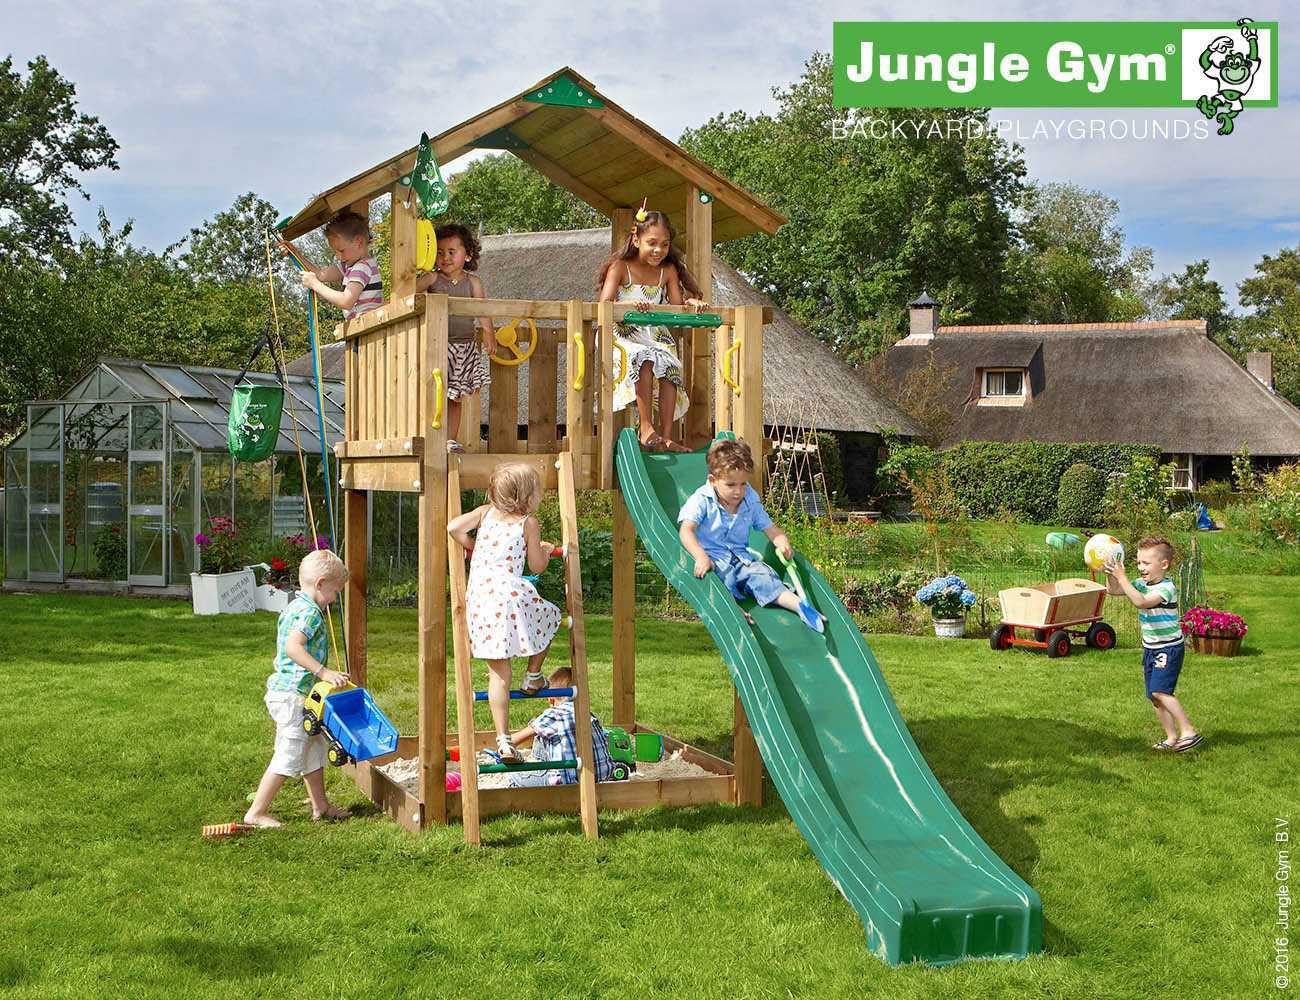 jungle gym kinder spielturm chalet mit rutsche holz heider. Black Bedroom Furniture Sets. Home Design Ideas